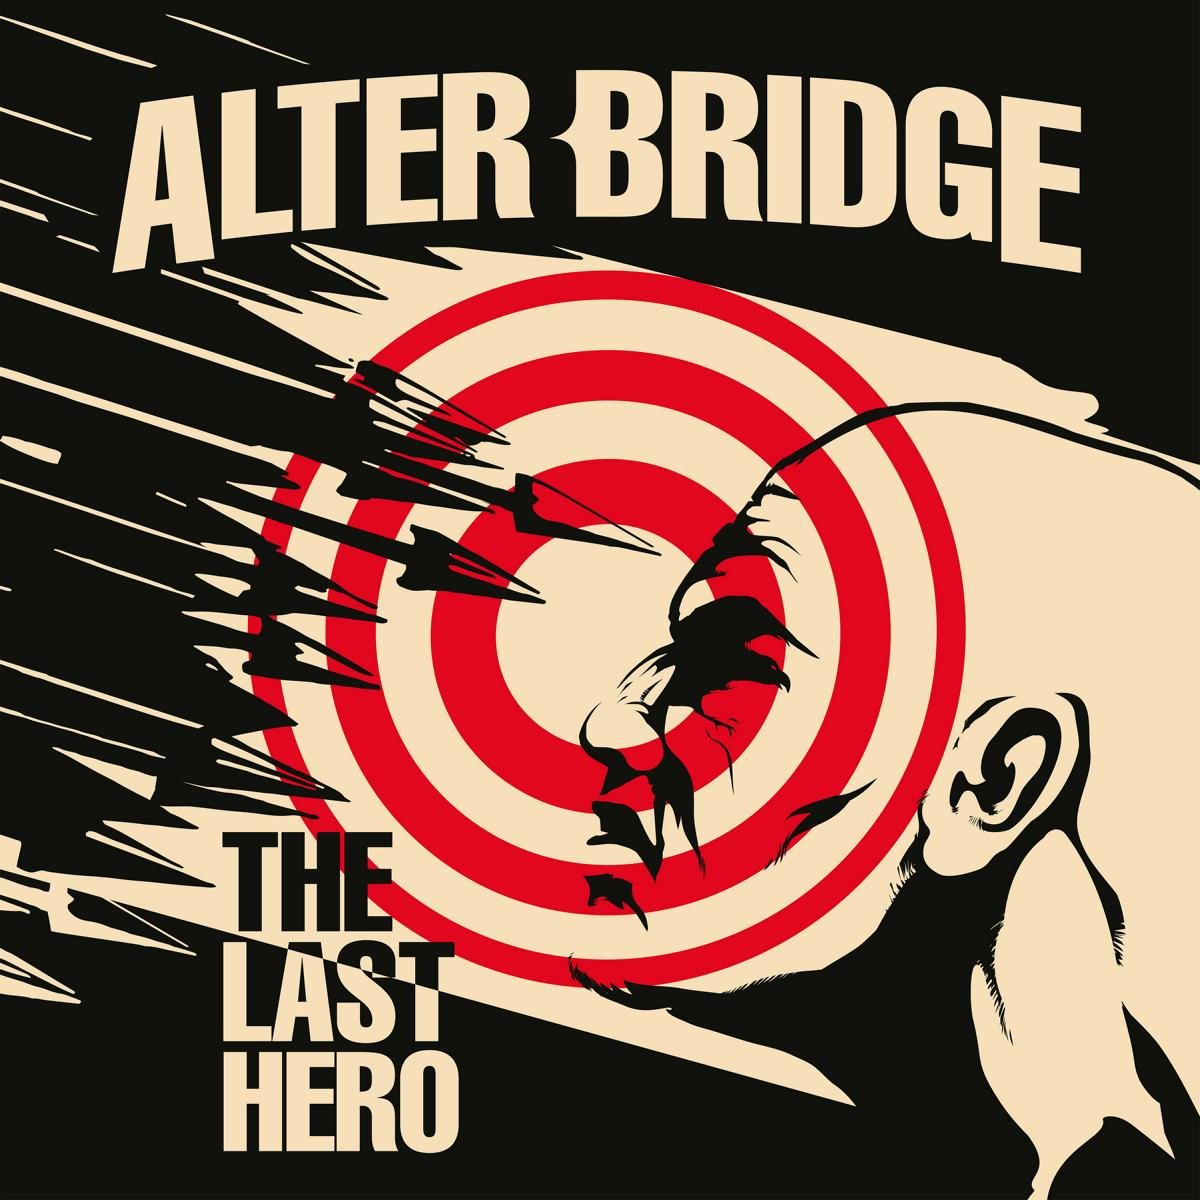 CD : Alter Bridge - The Last Hero (Digipack Packaging)